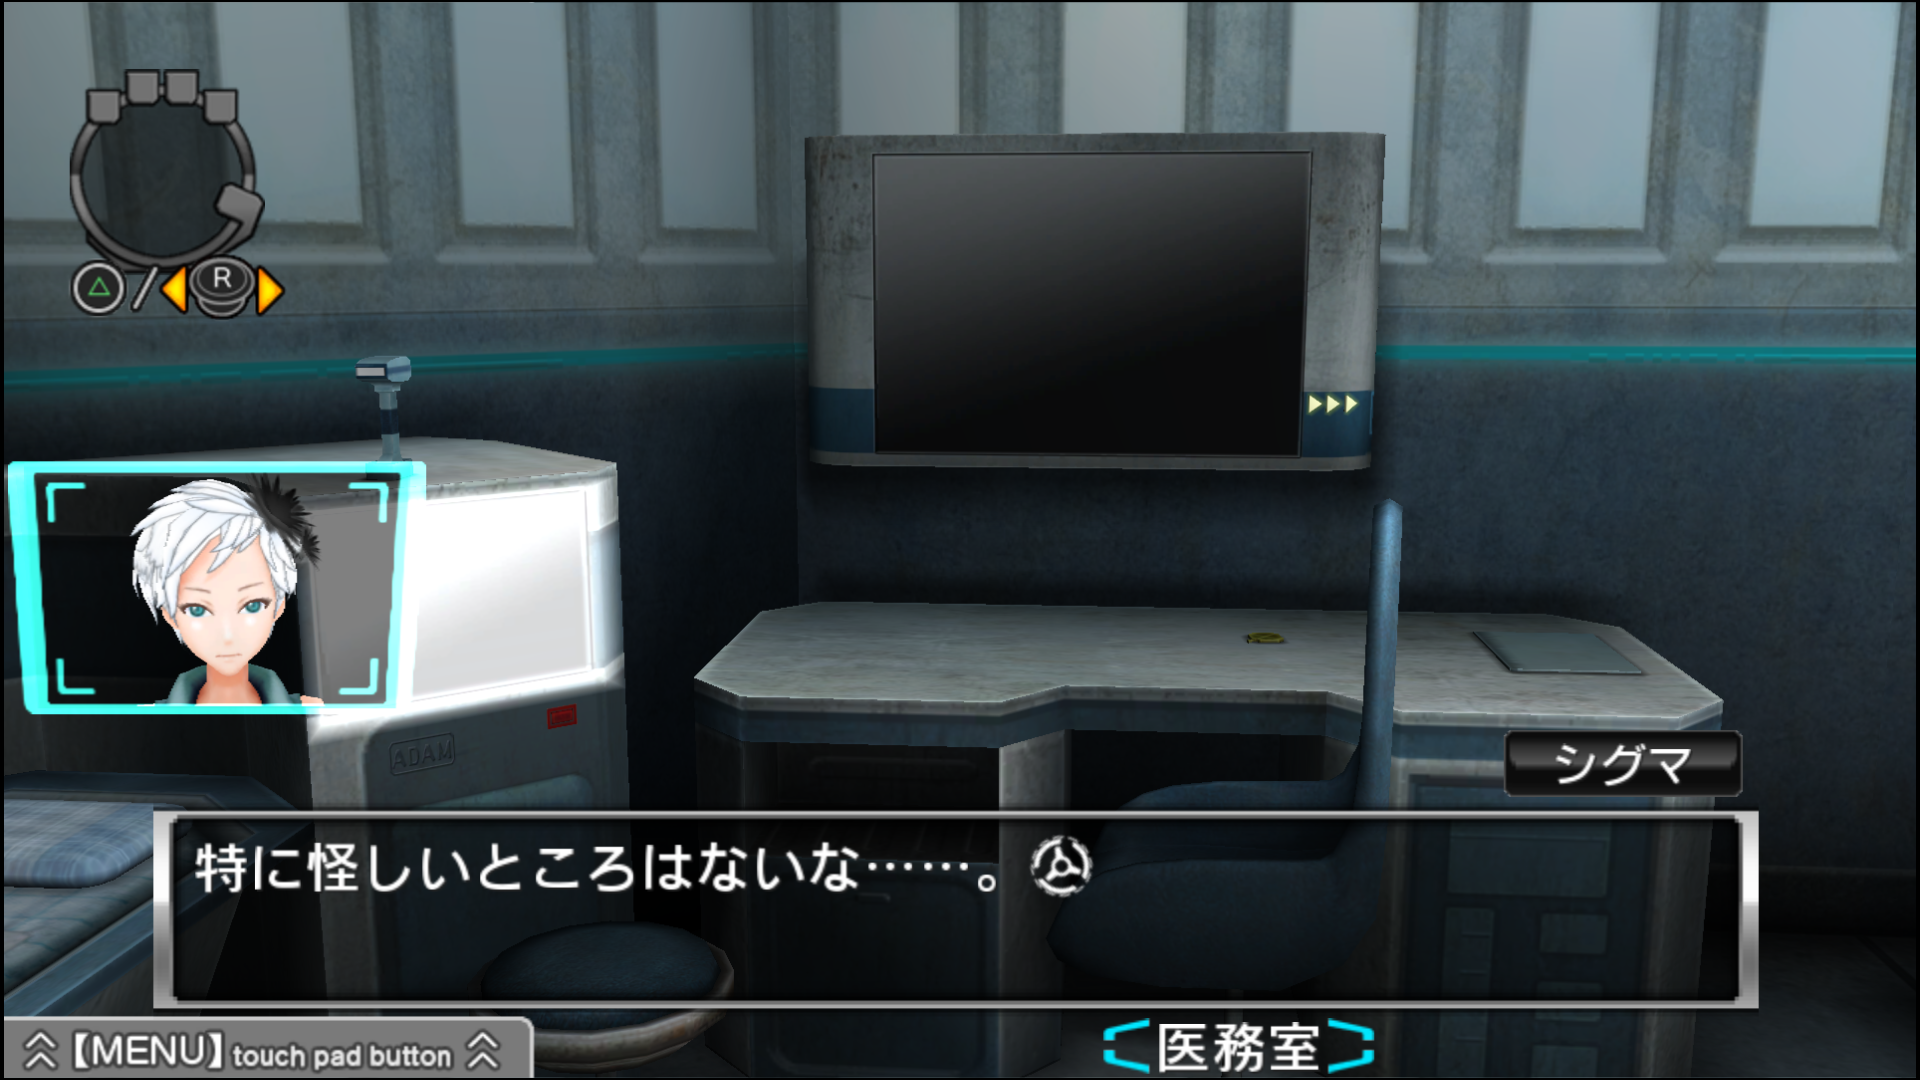 『ZERO ESCAPE 9時間9人9の扉 善人シボウデス ダブルパック』ゲーム画面